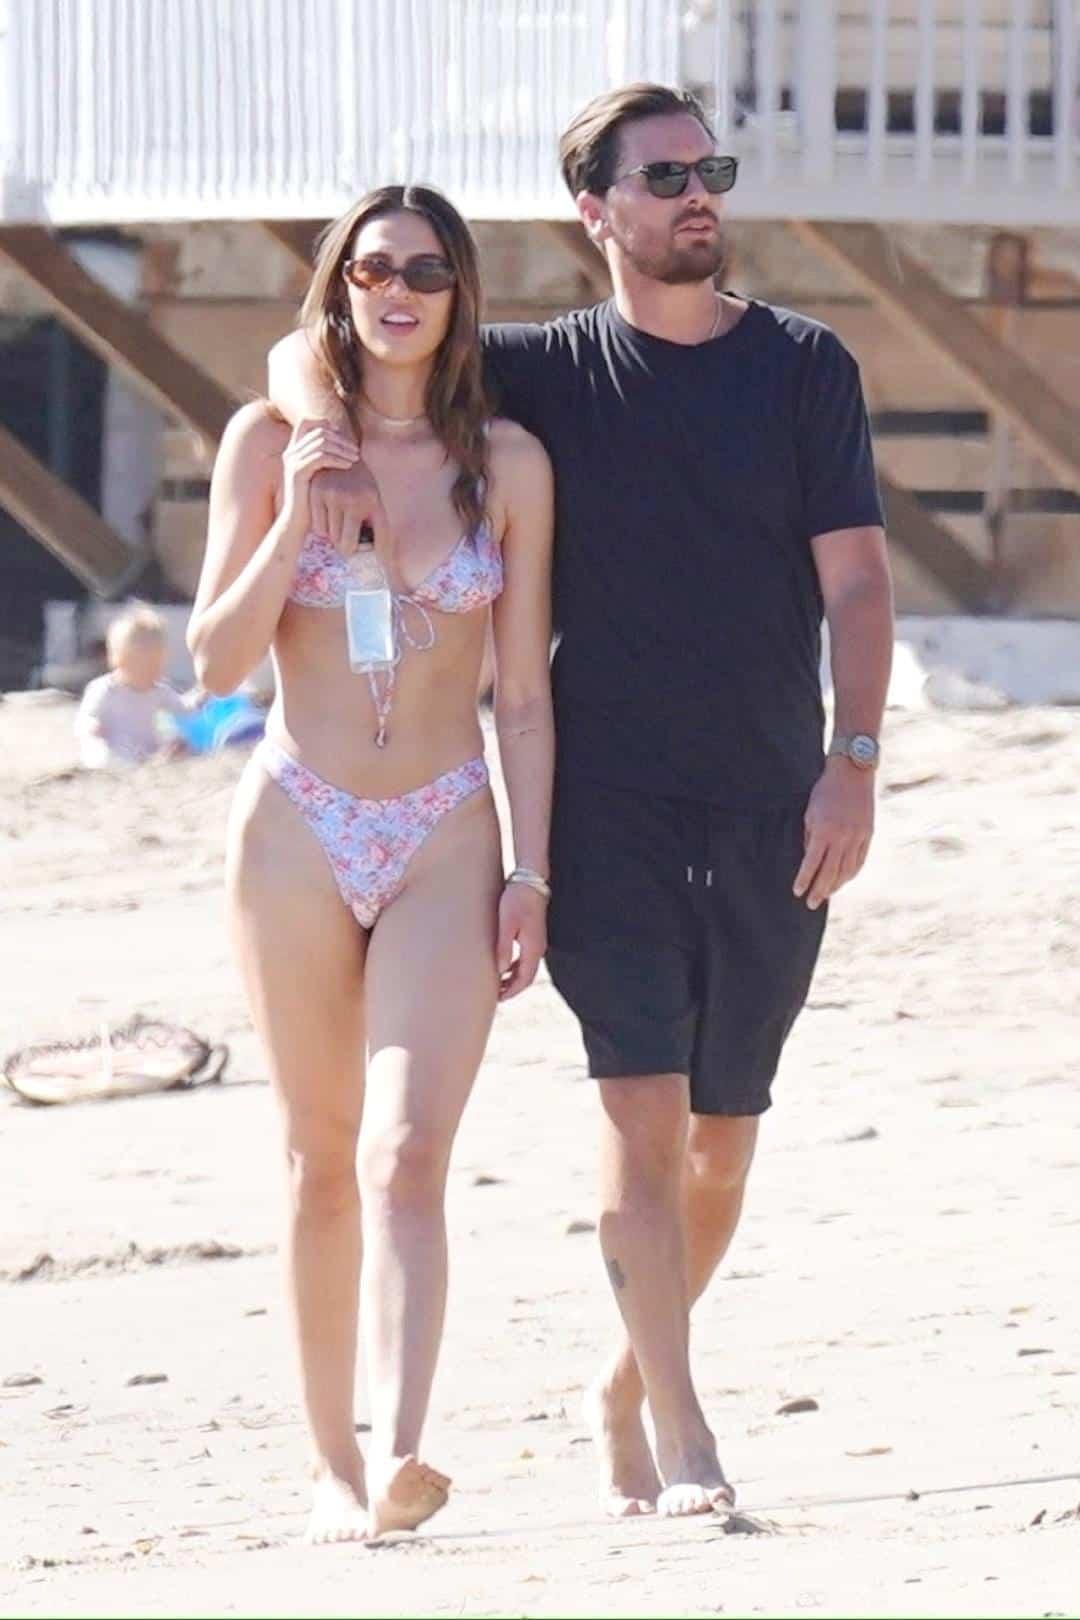 Amelia Hamlin and Scott Disick walking on the beach with Scott's arms around Amelia